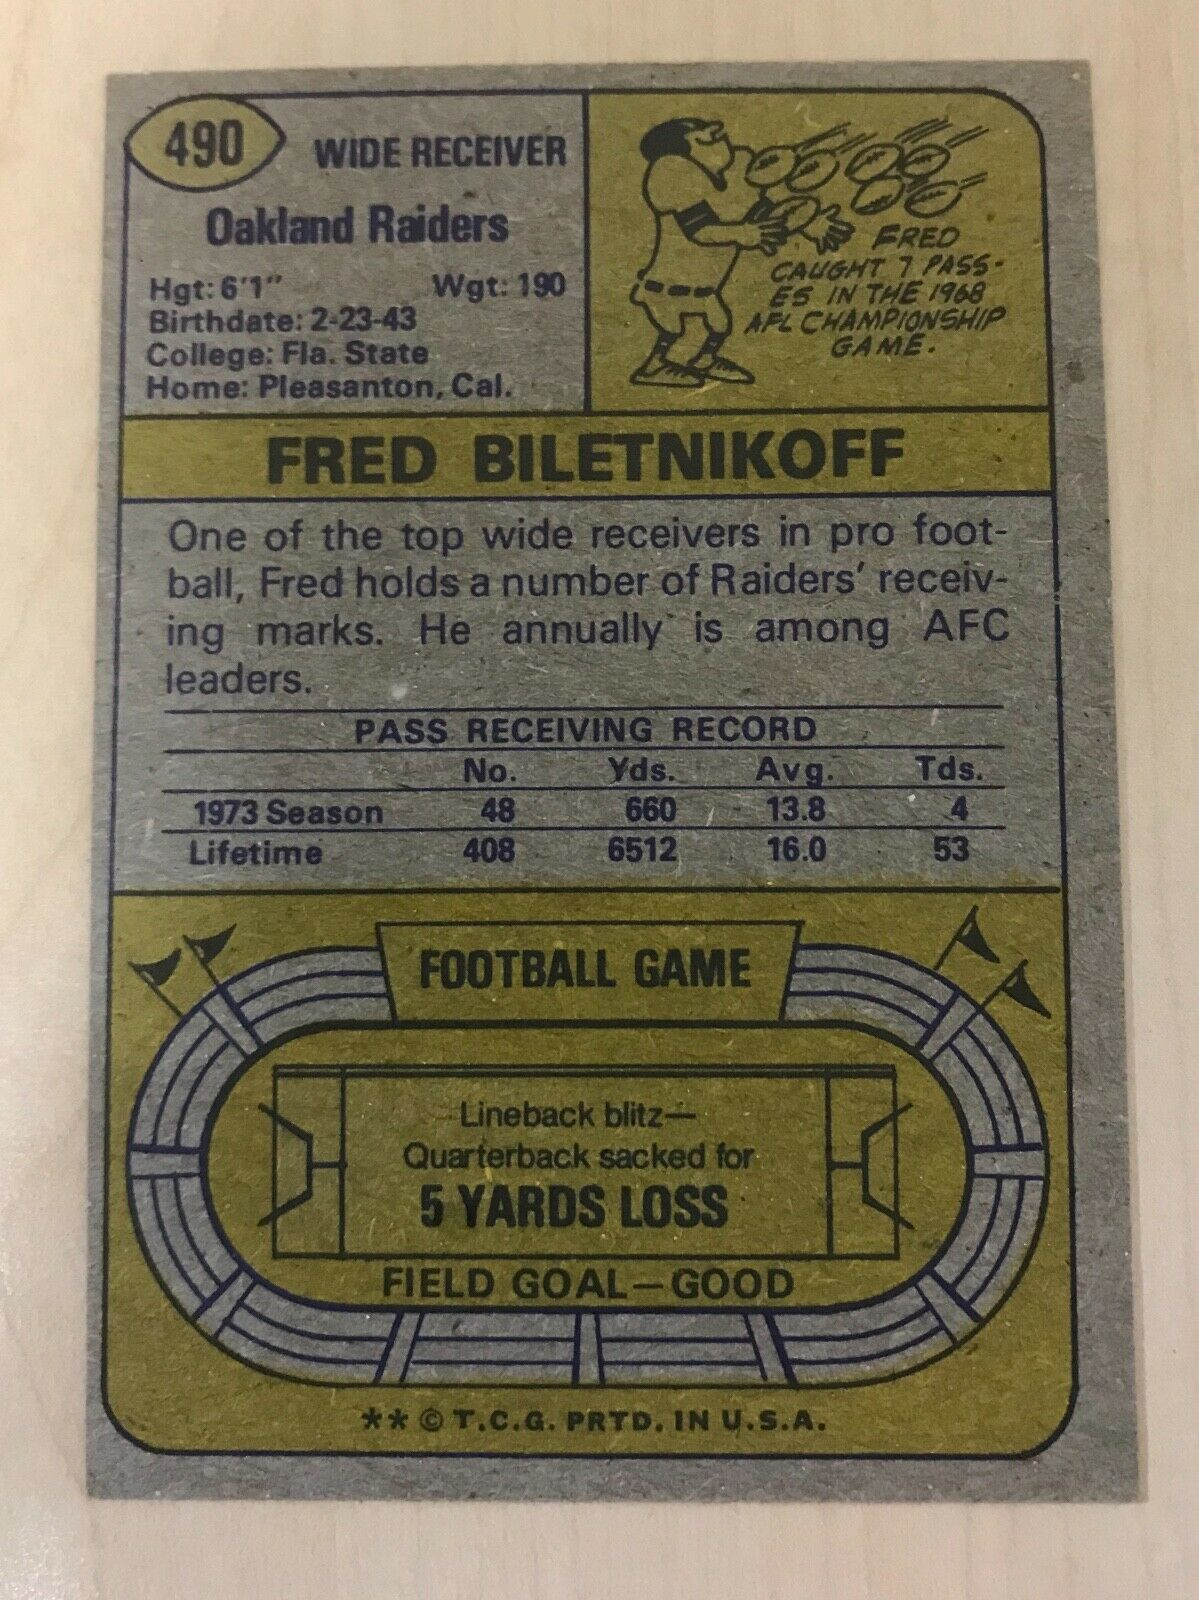 1974 Topps Football #490 Fred Biletnikoff Oakland Raiders HOF